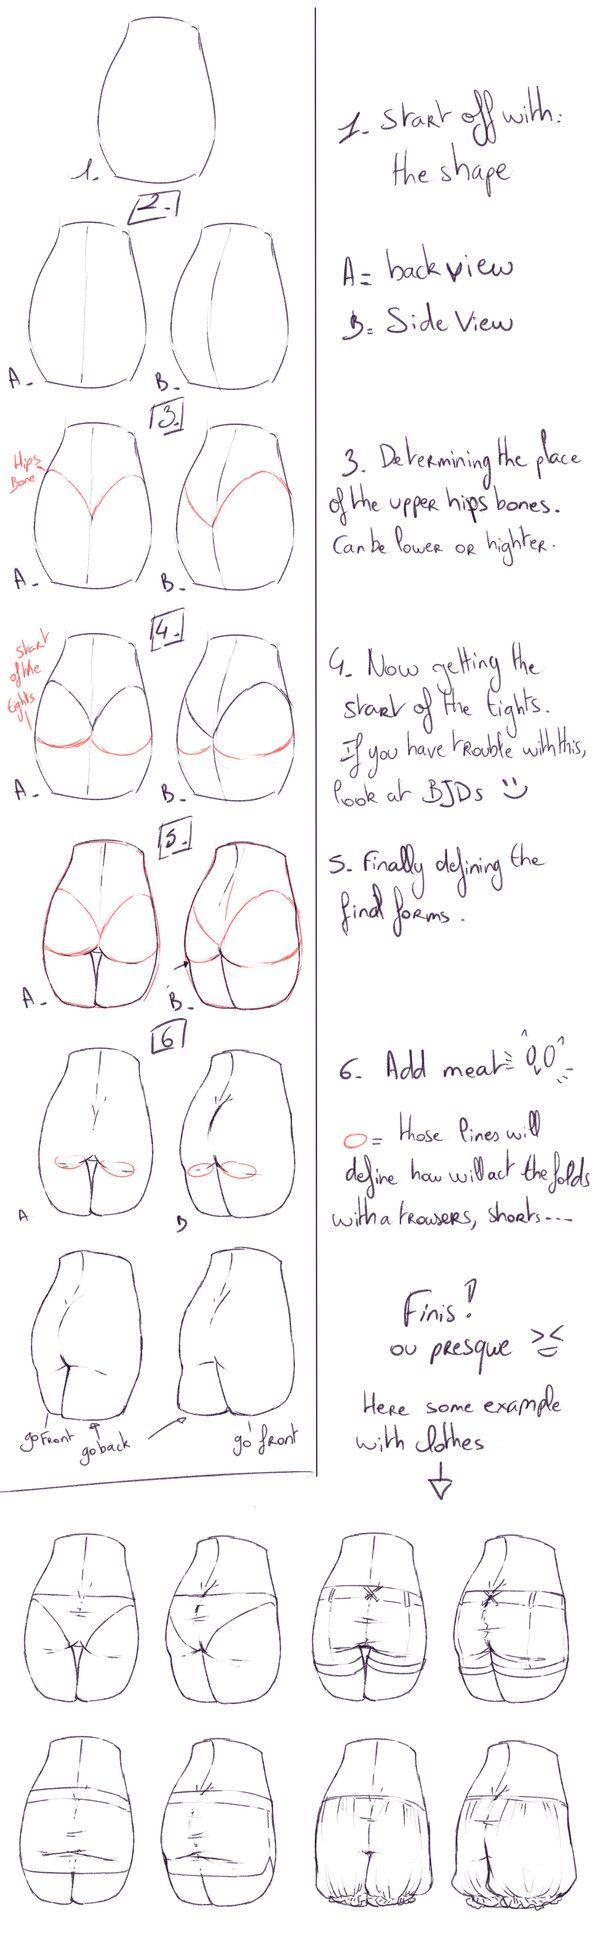 How I draw buttocks by rika-dono.deviantart.com on @DeviantArt